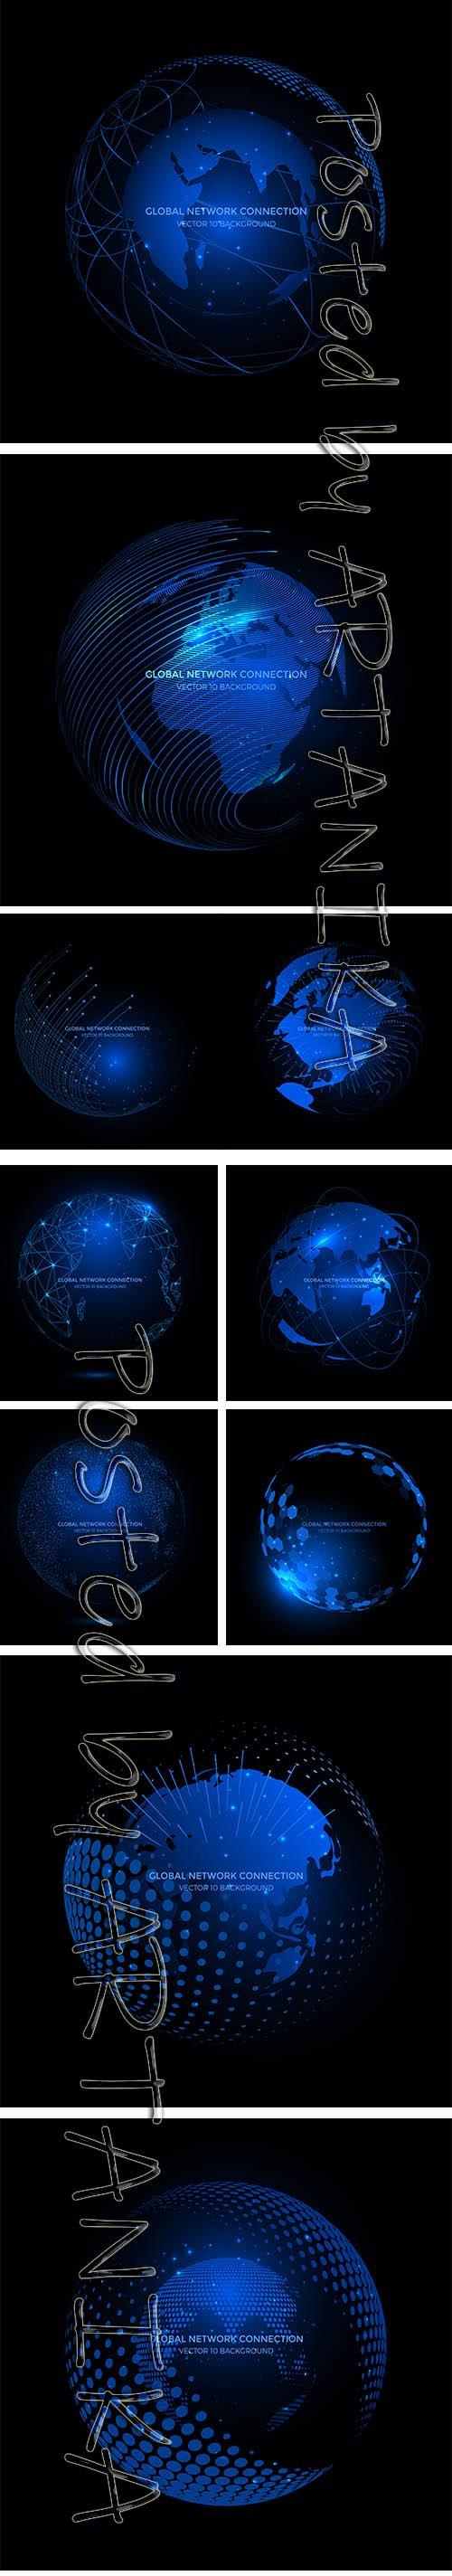 Communication Technology Internet Business Connection Backgrounds Set